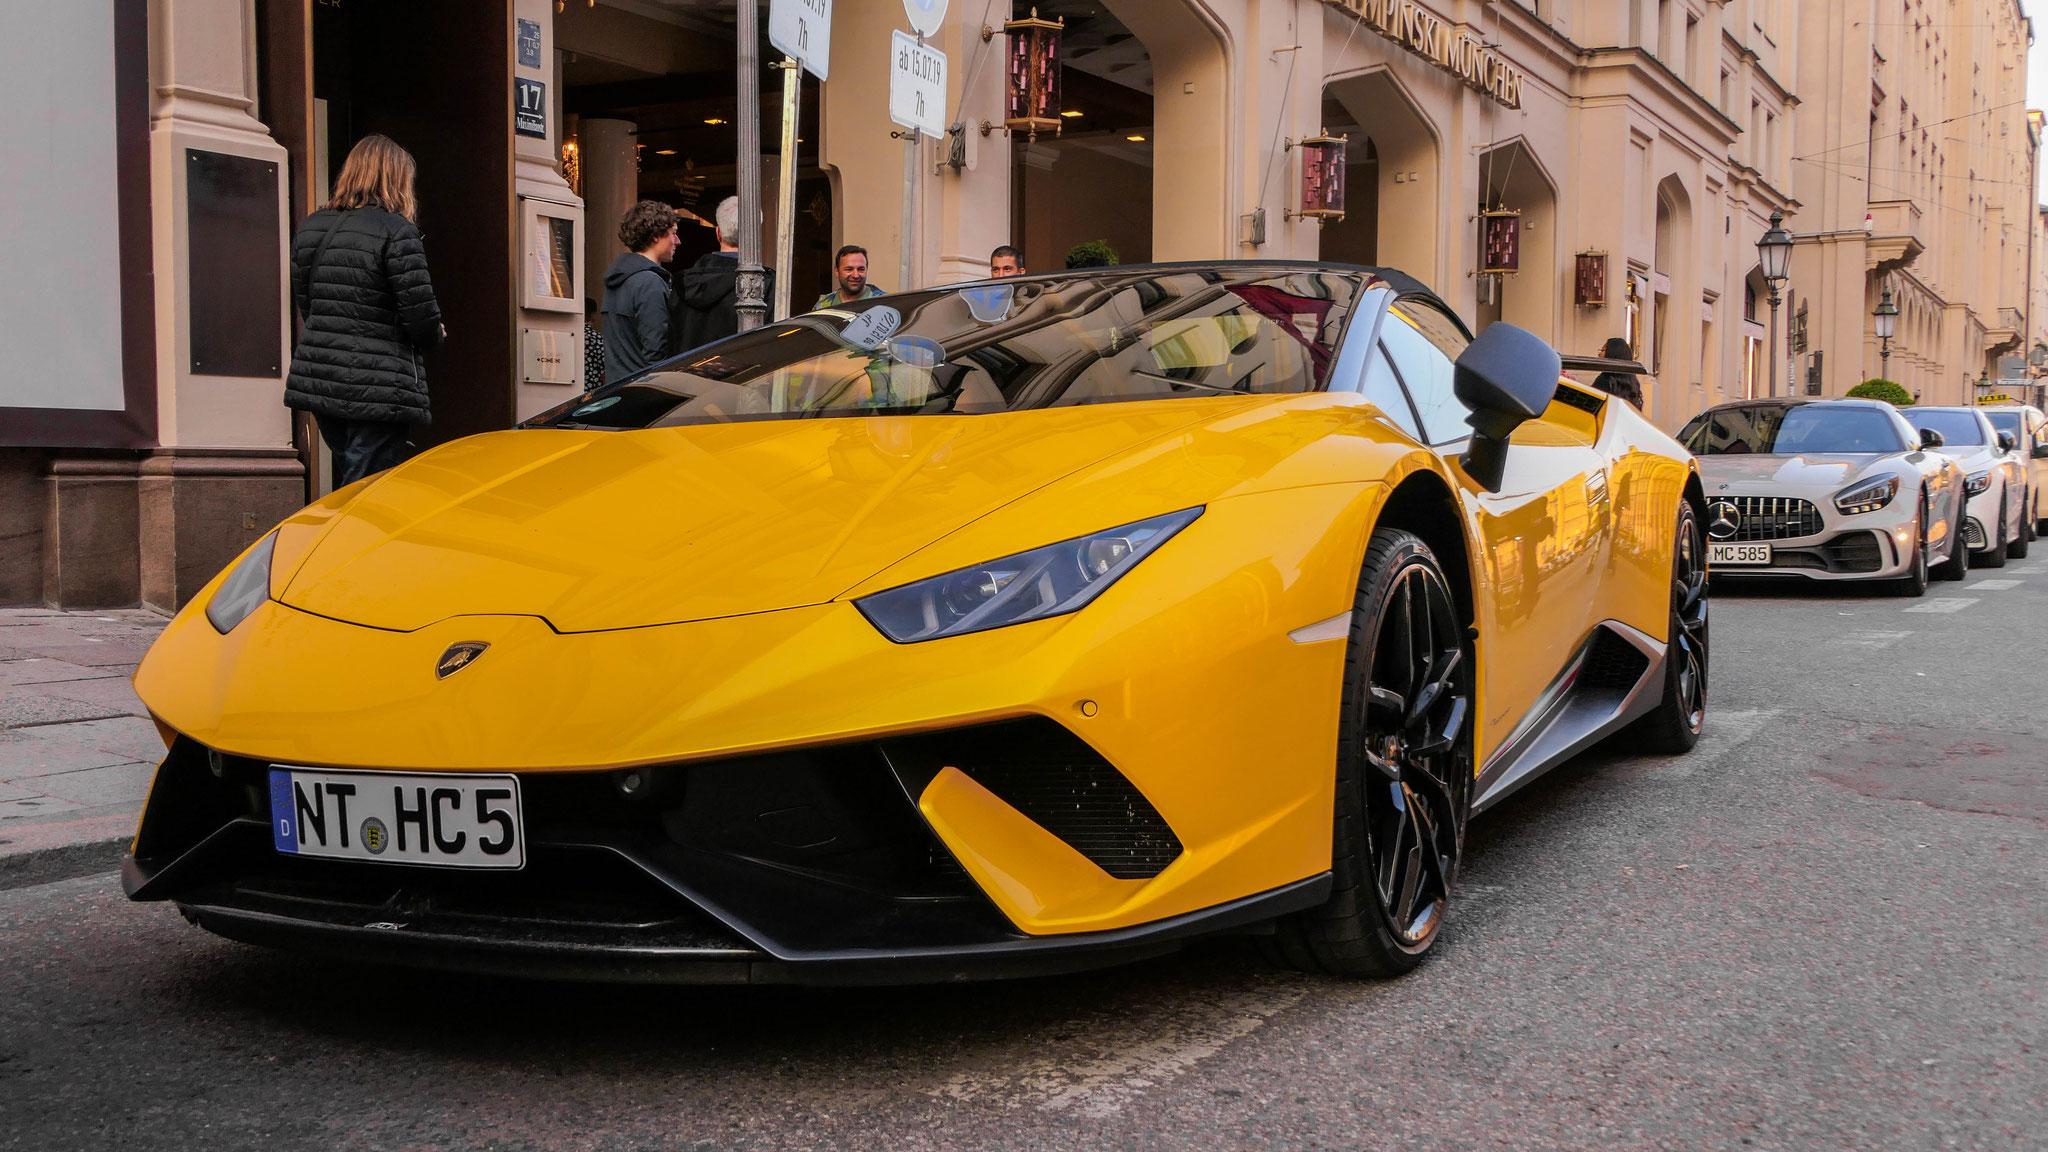 Lamborghini Huracan Performante Spyder - NT-HC-5